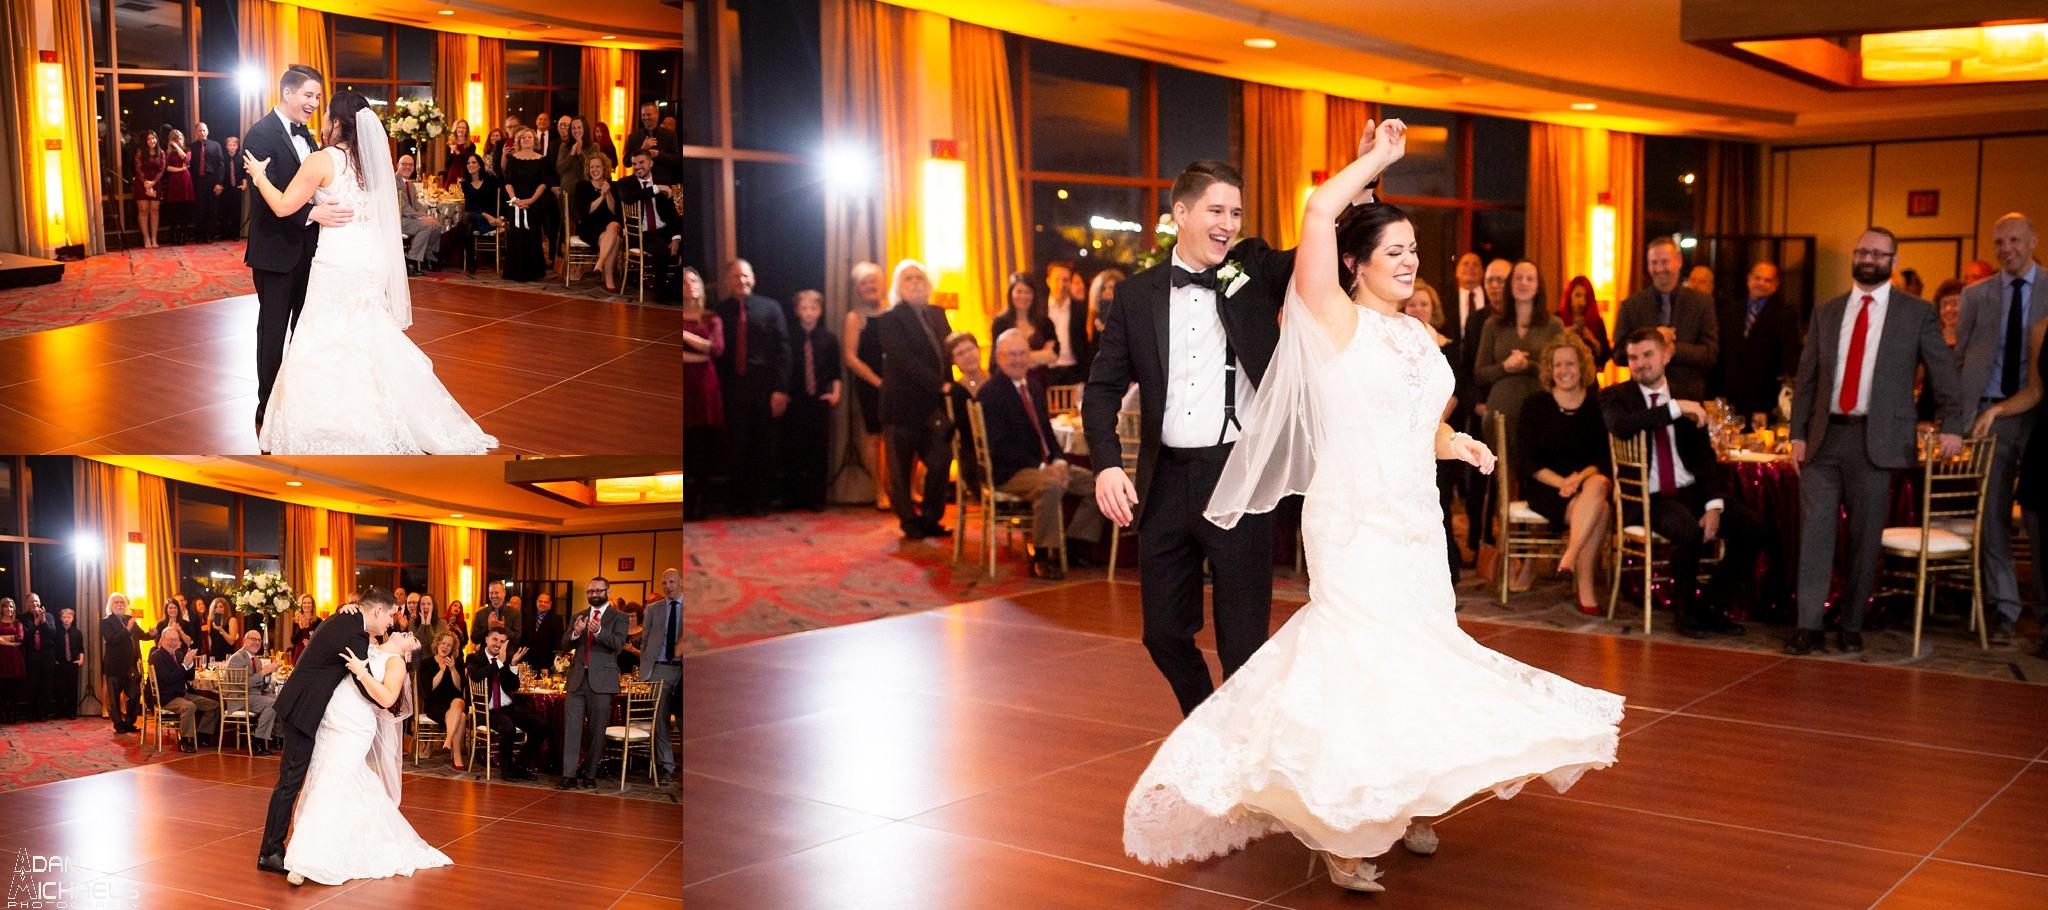 Wyndham Grand Pittsburgh Wedding Reception Pictures_3029.jpg